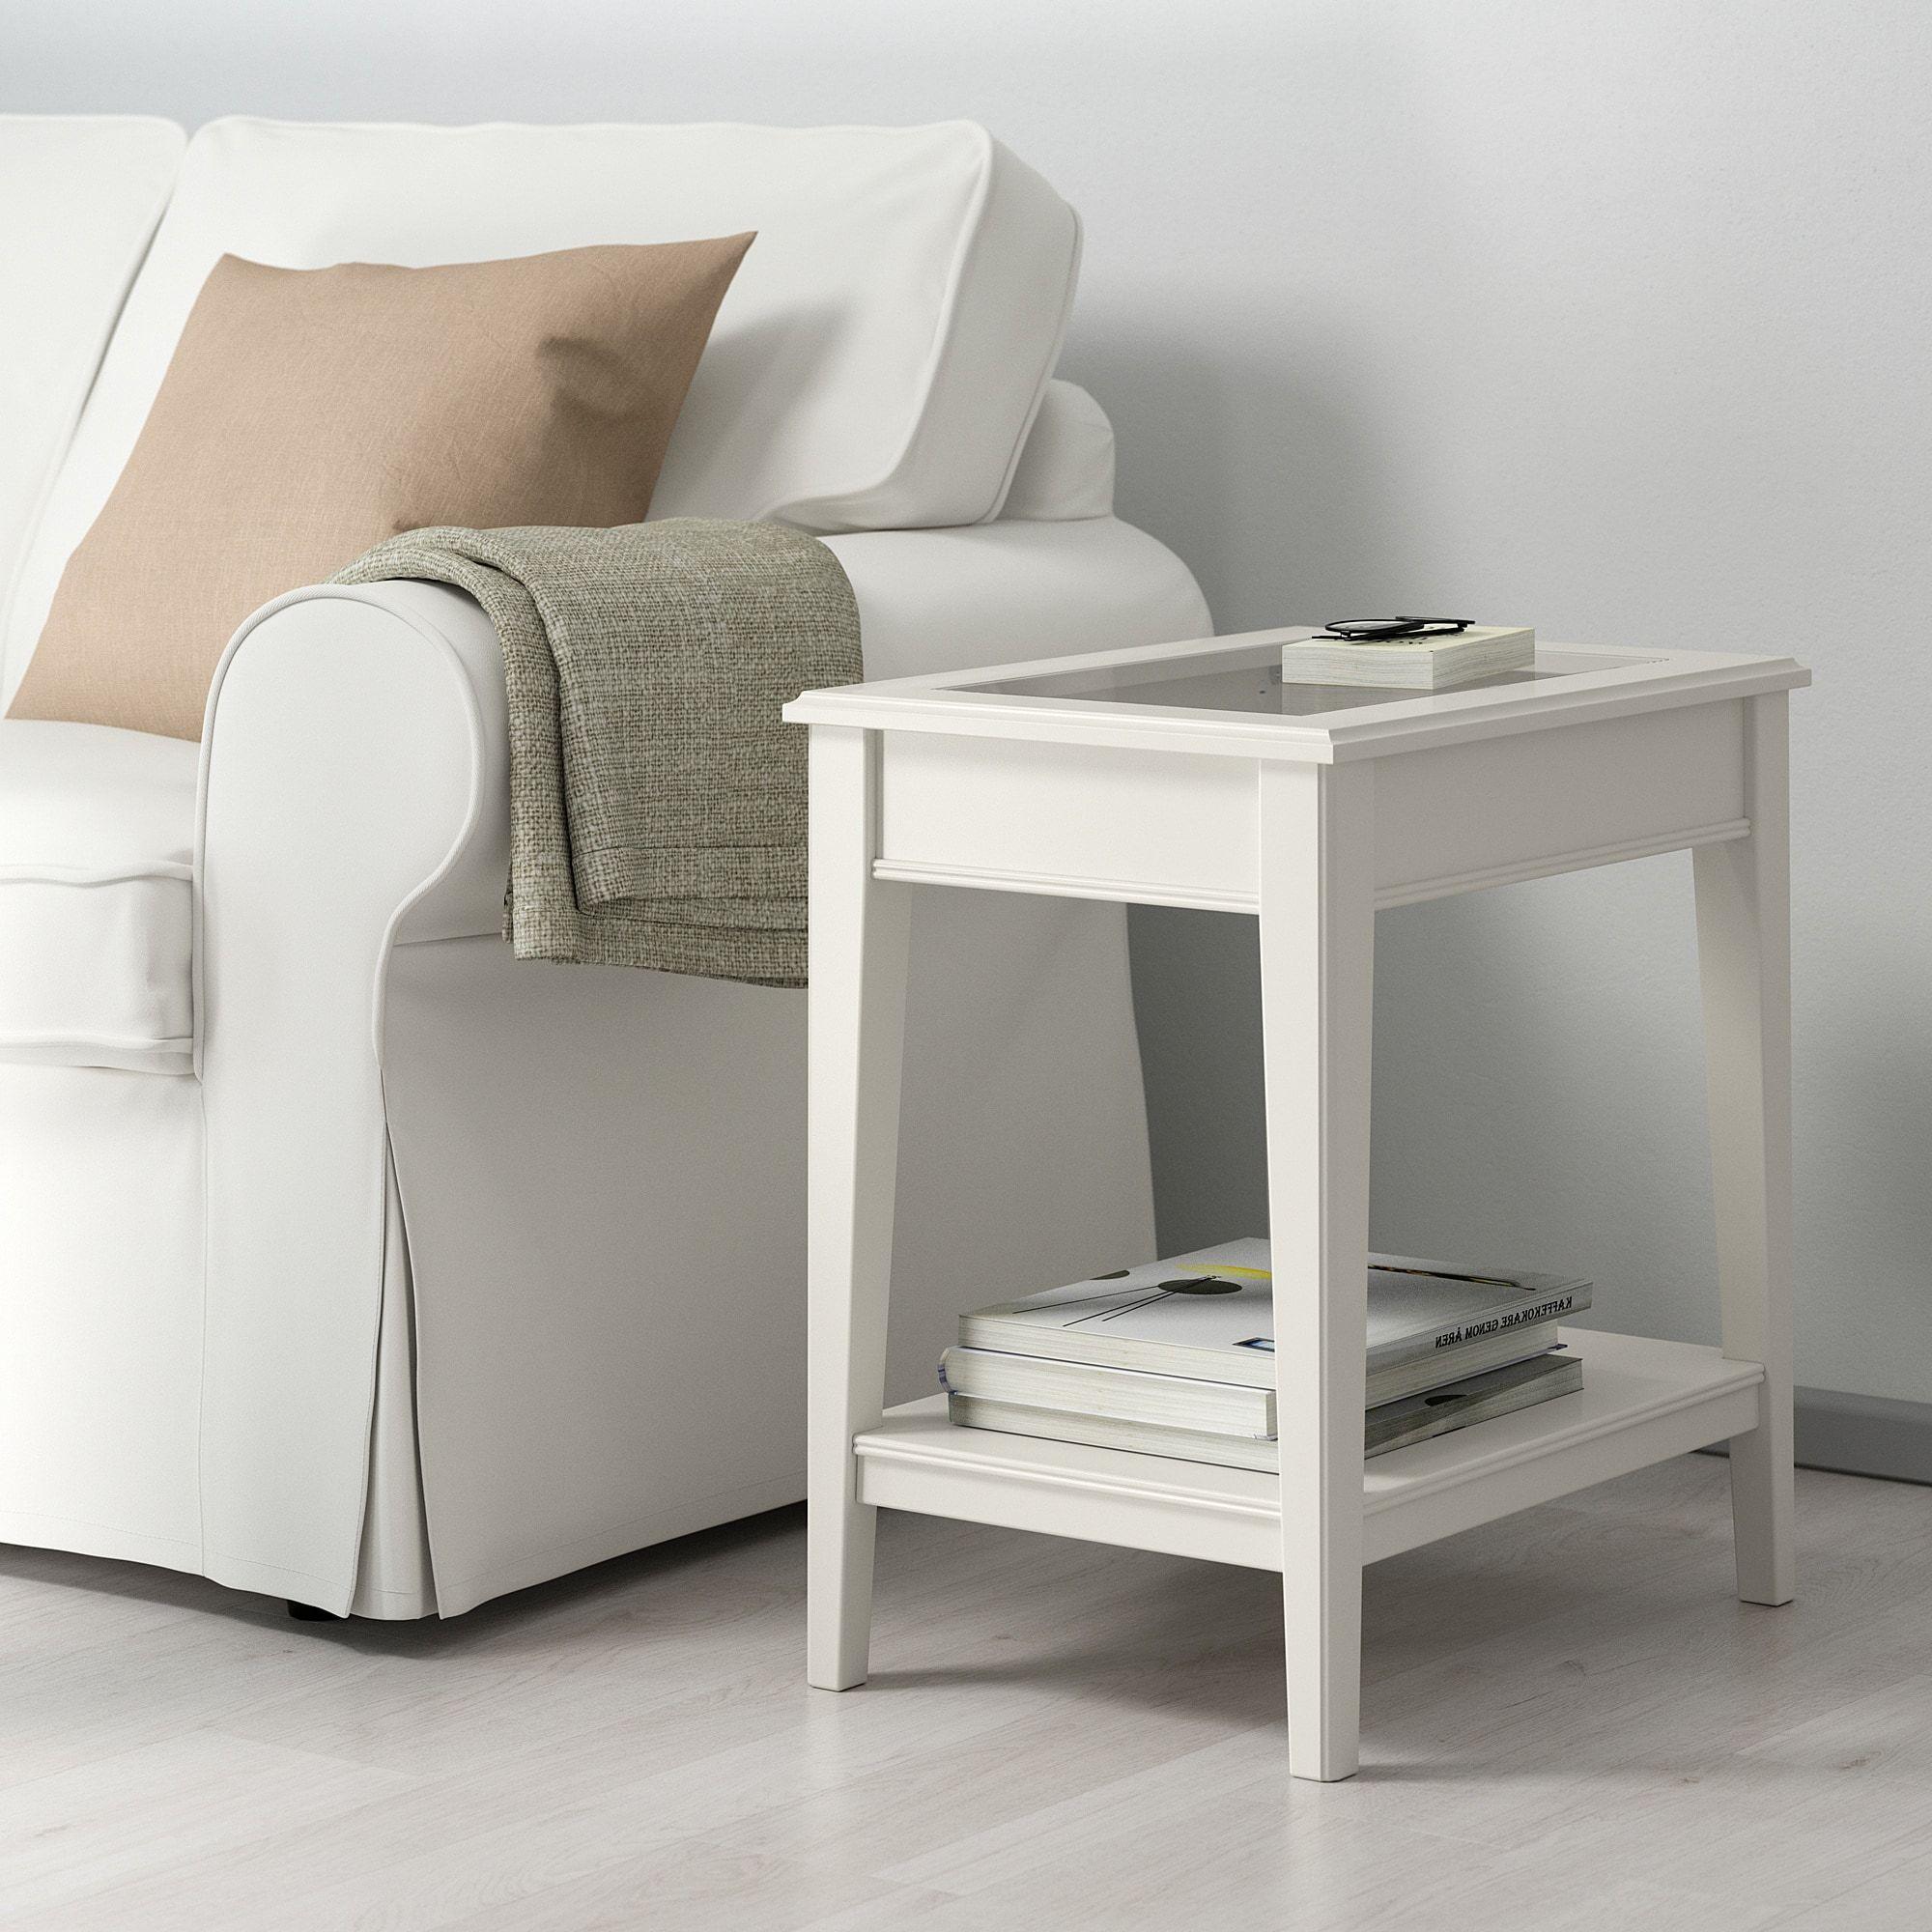 Liatorp White Glass Side Table 57x40 Cm Ikea Ikea Side Table White Side Tables Liatorp [ 2000 x 2000 Pixel ]